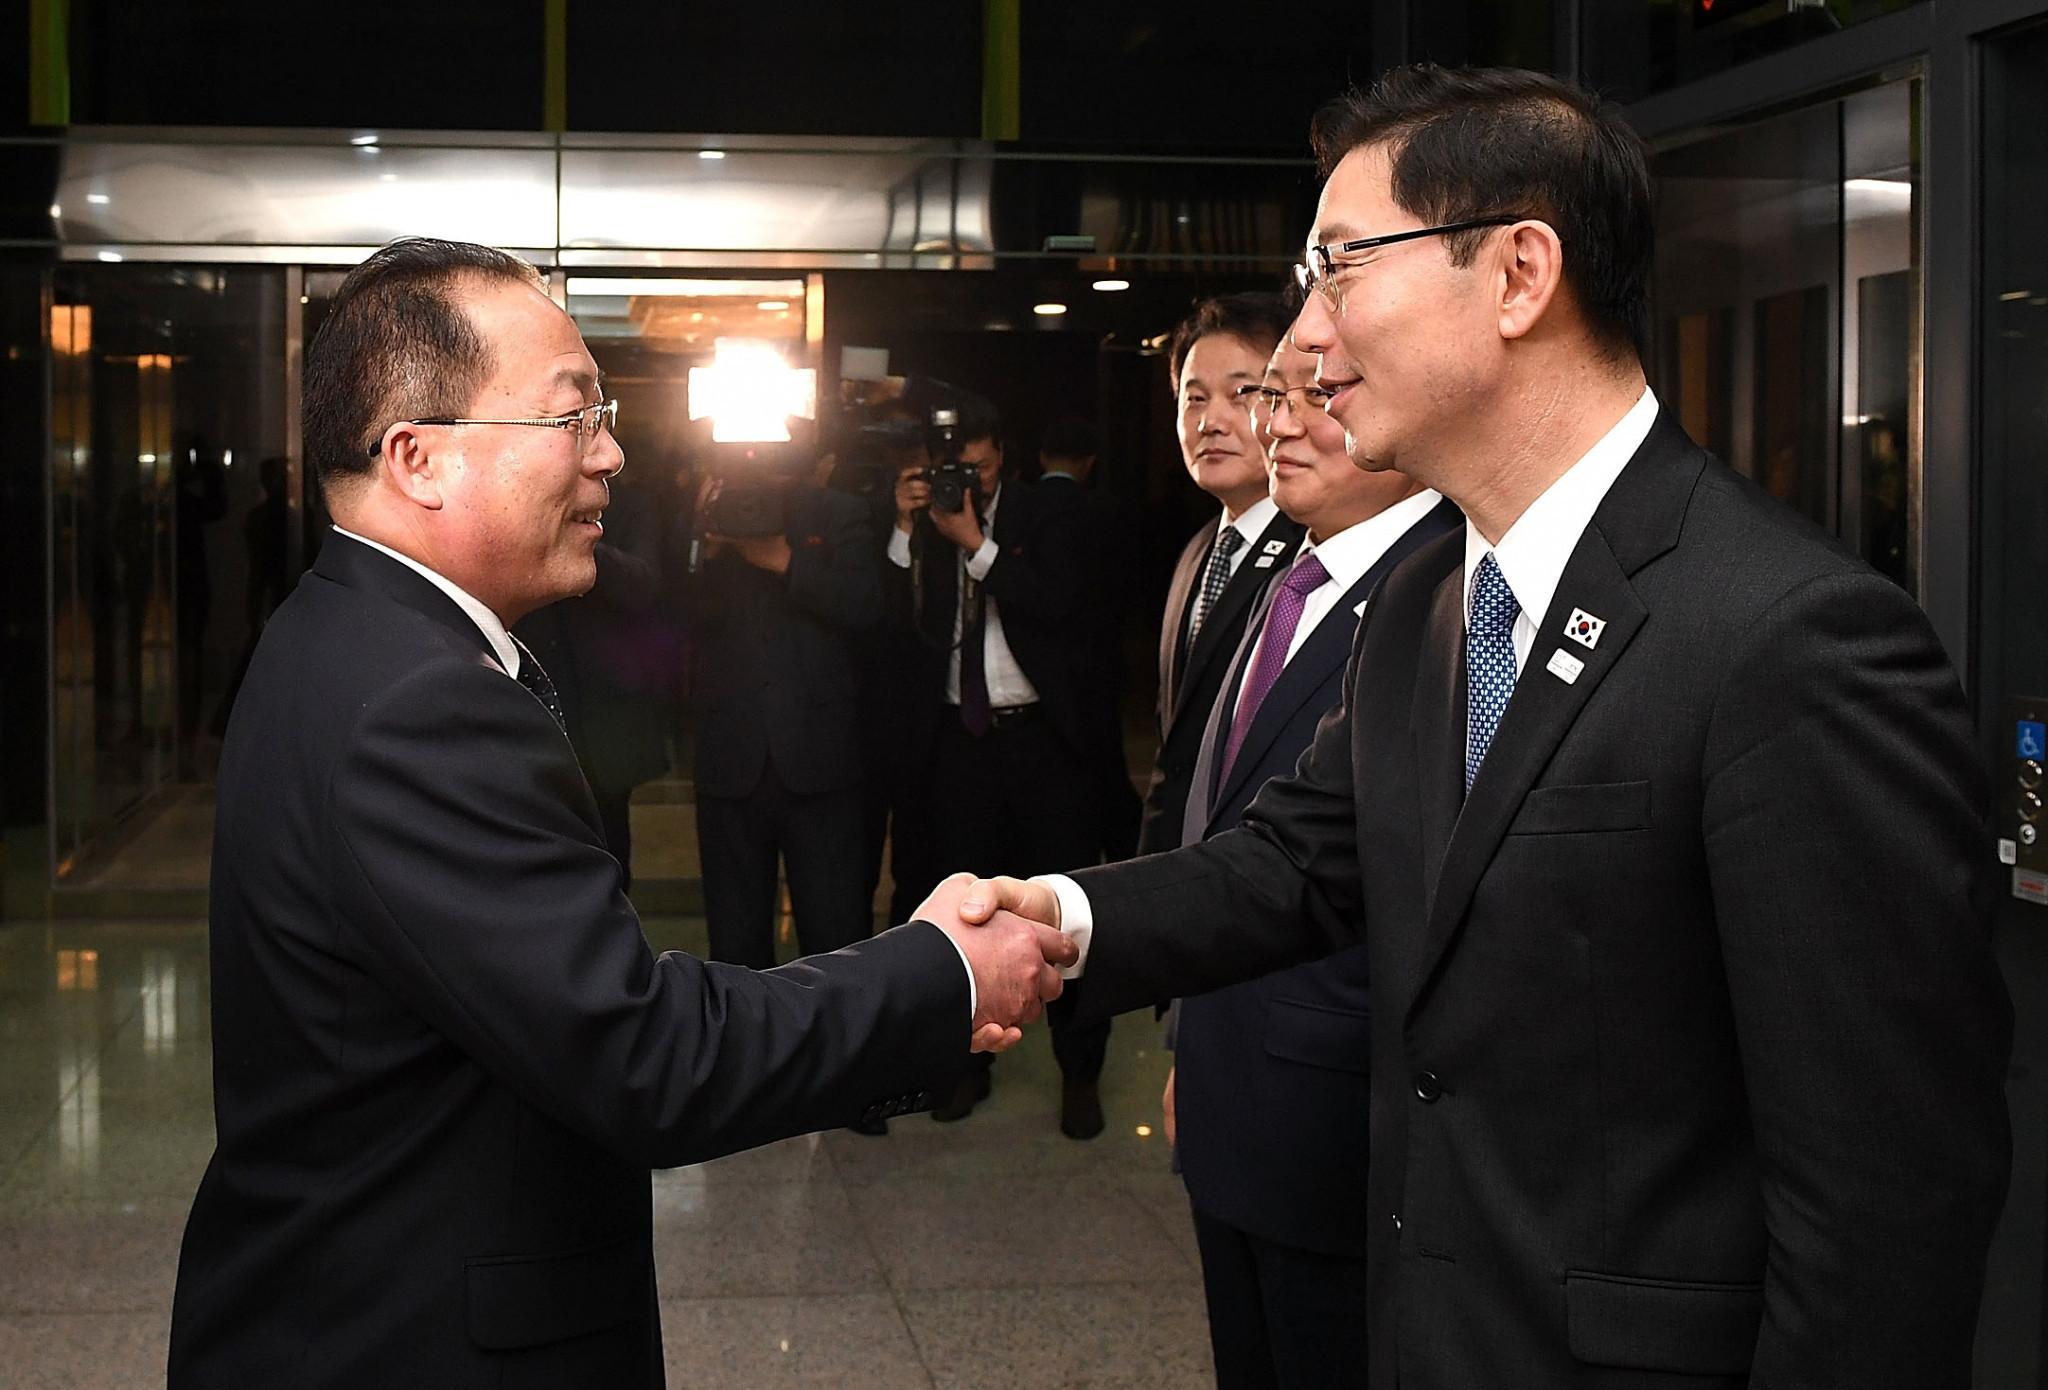 Talks between North Korea and South Korea have begun prior to Pyeongchang 2018 ©Getty Images